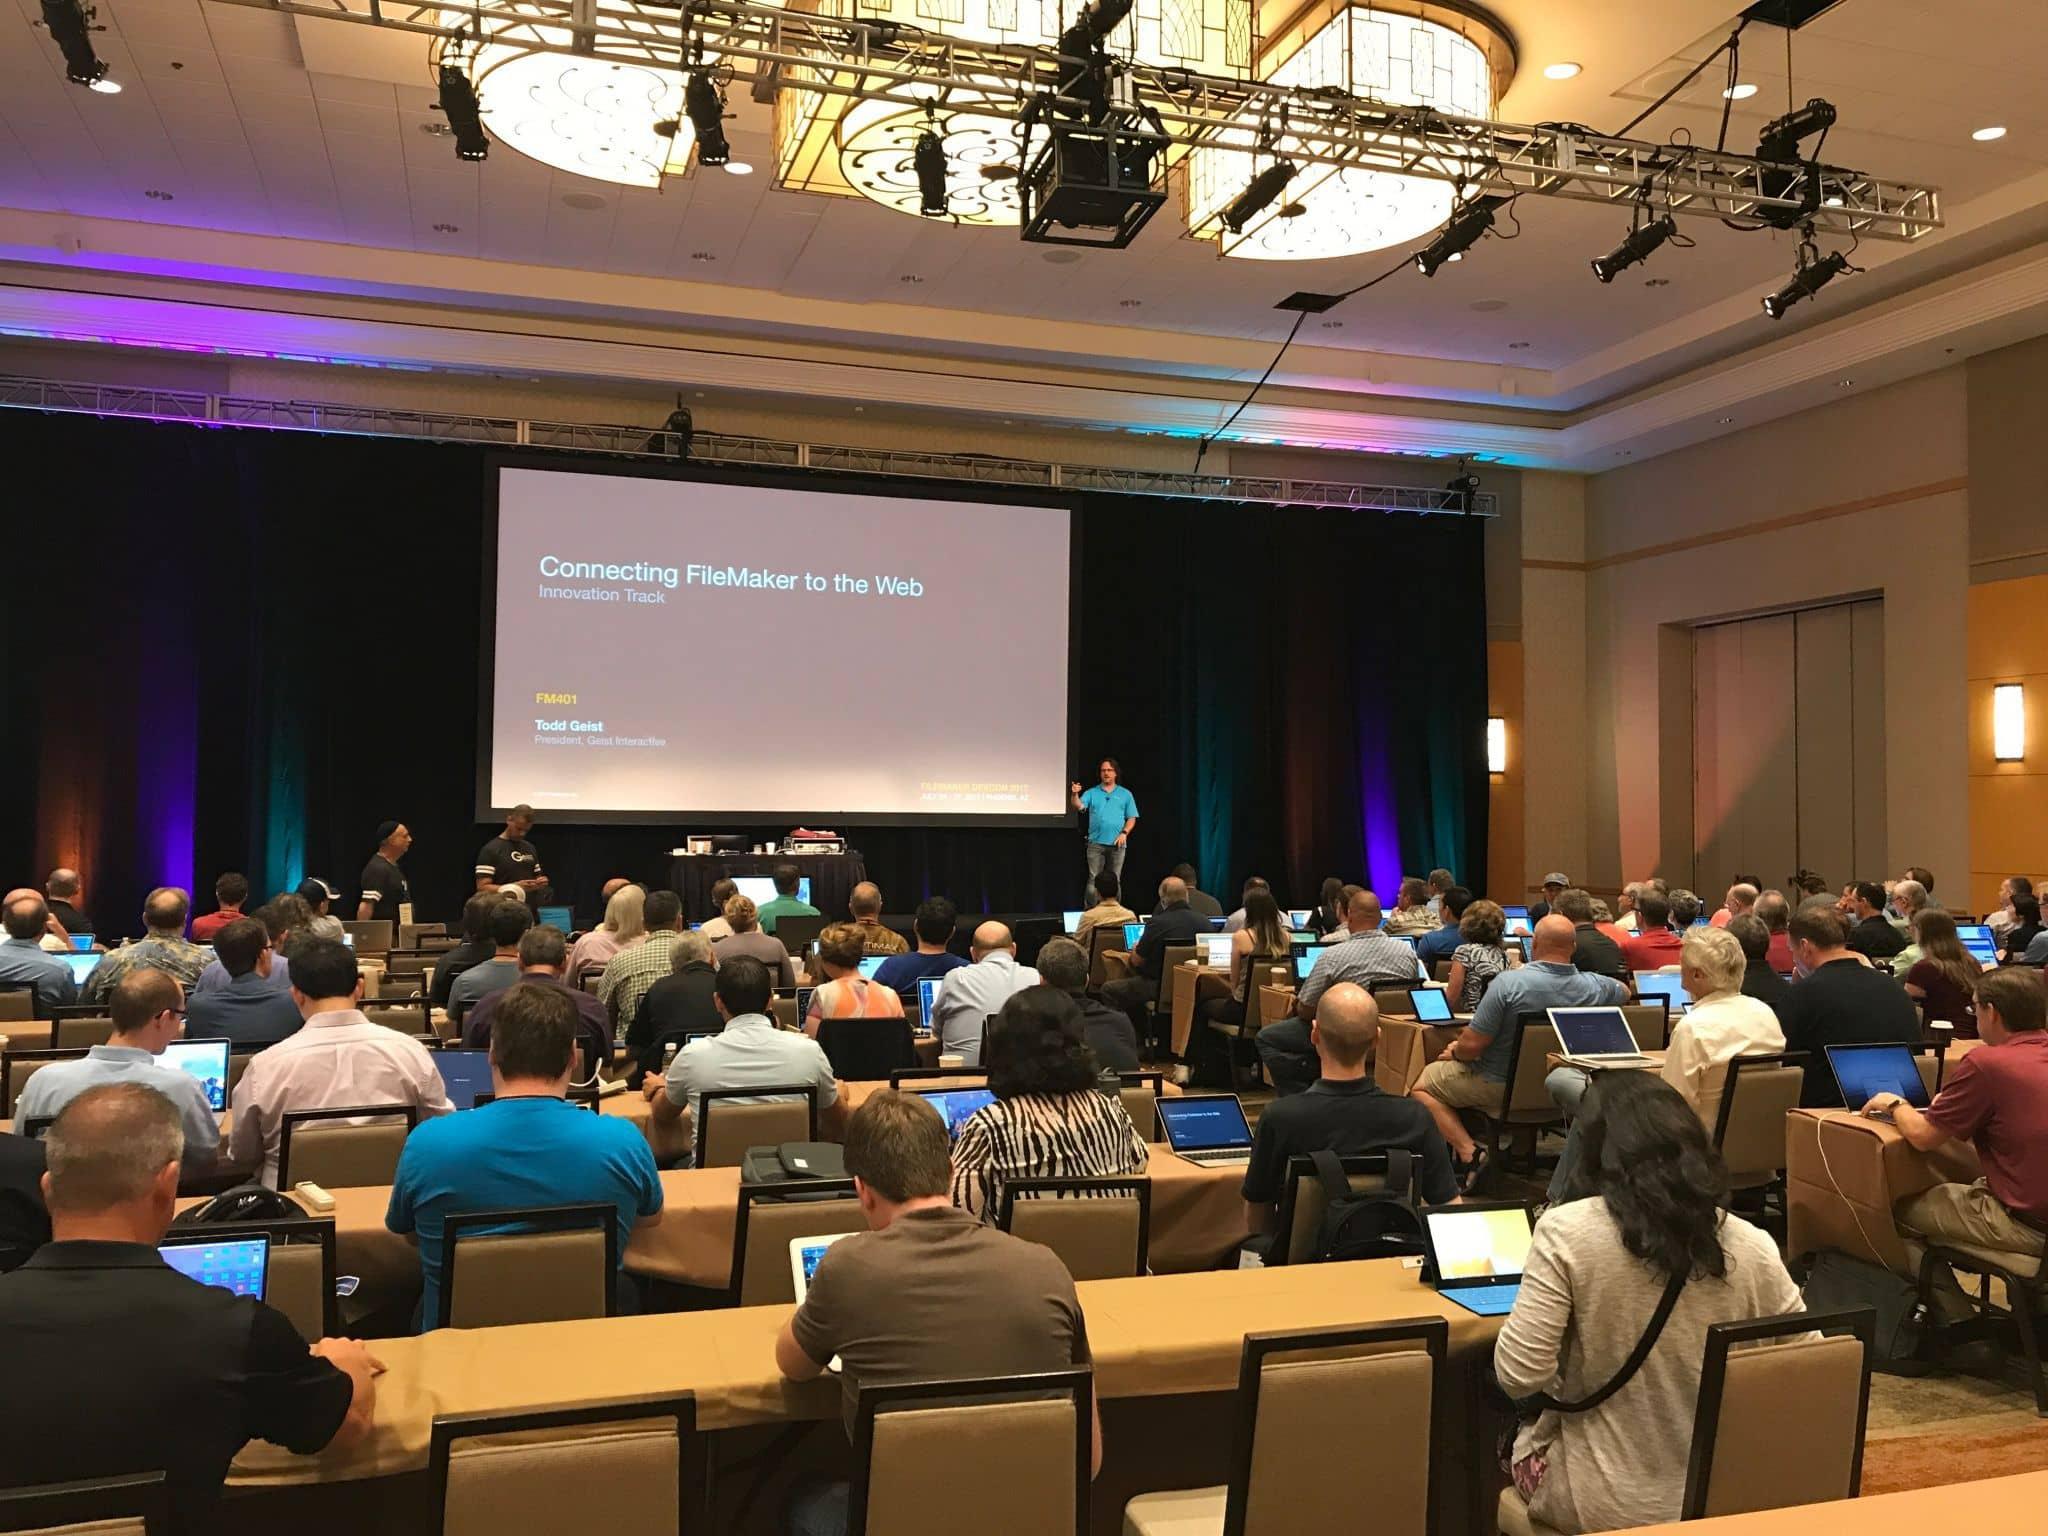 FileMaker DevCon 2019 - Developer Conference in Orlando